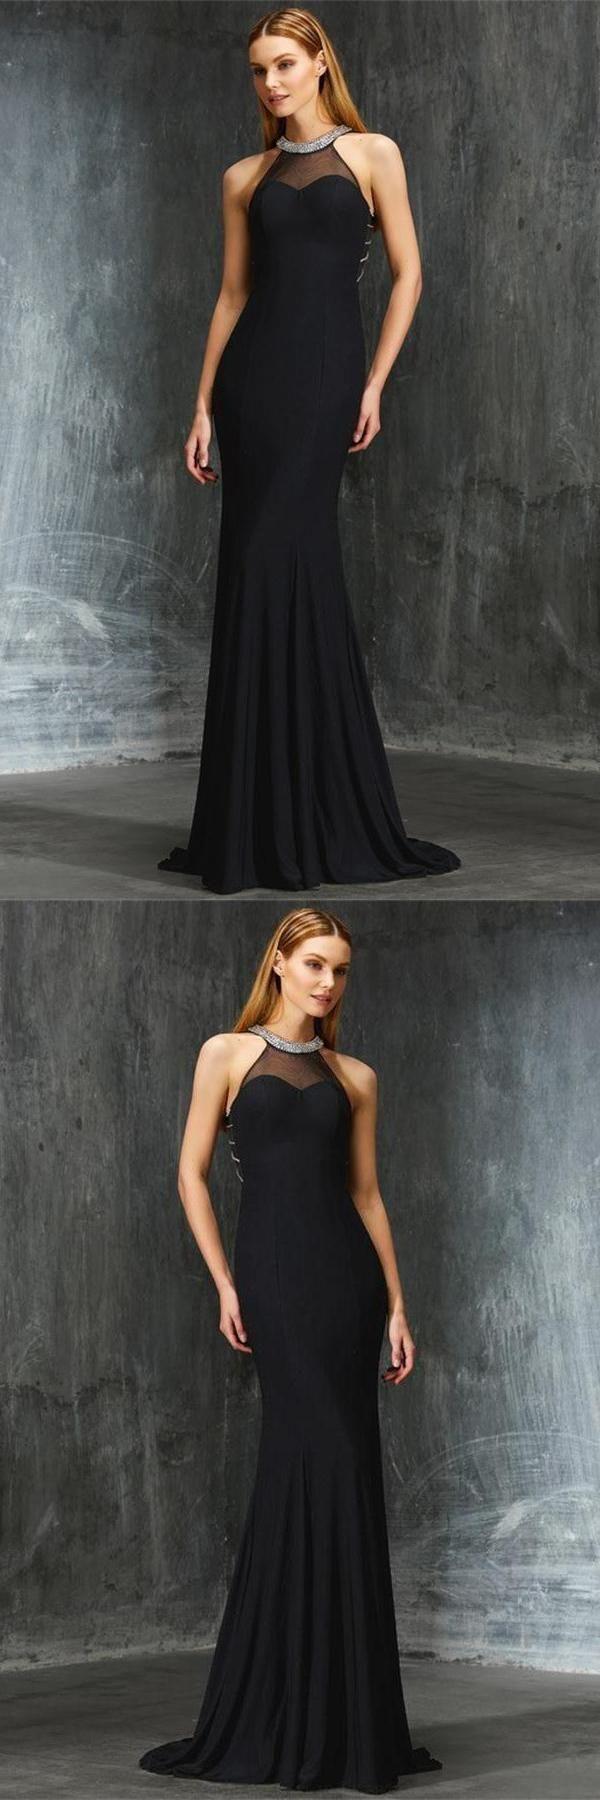 Prom dresses mermaid black prom dresses simple prom dresses prom